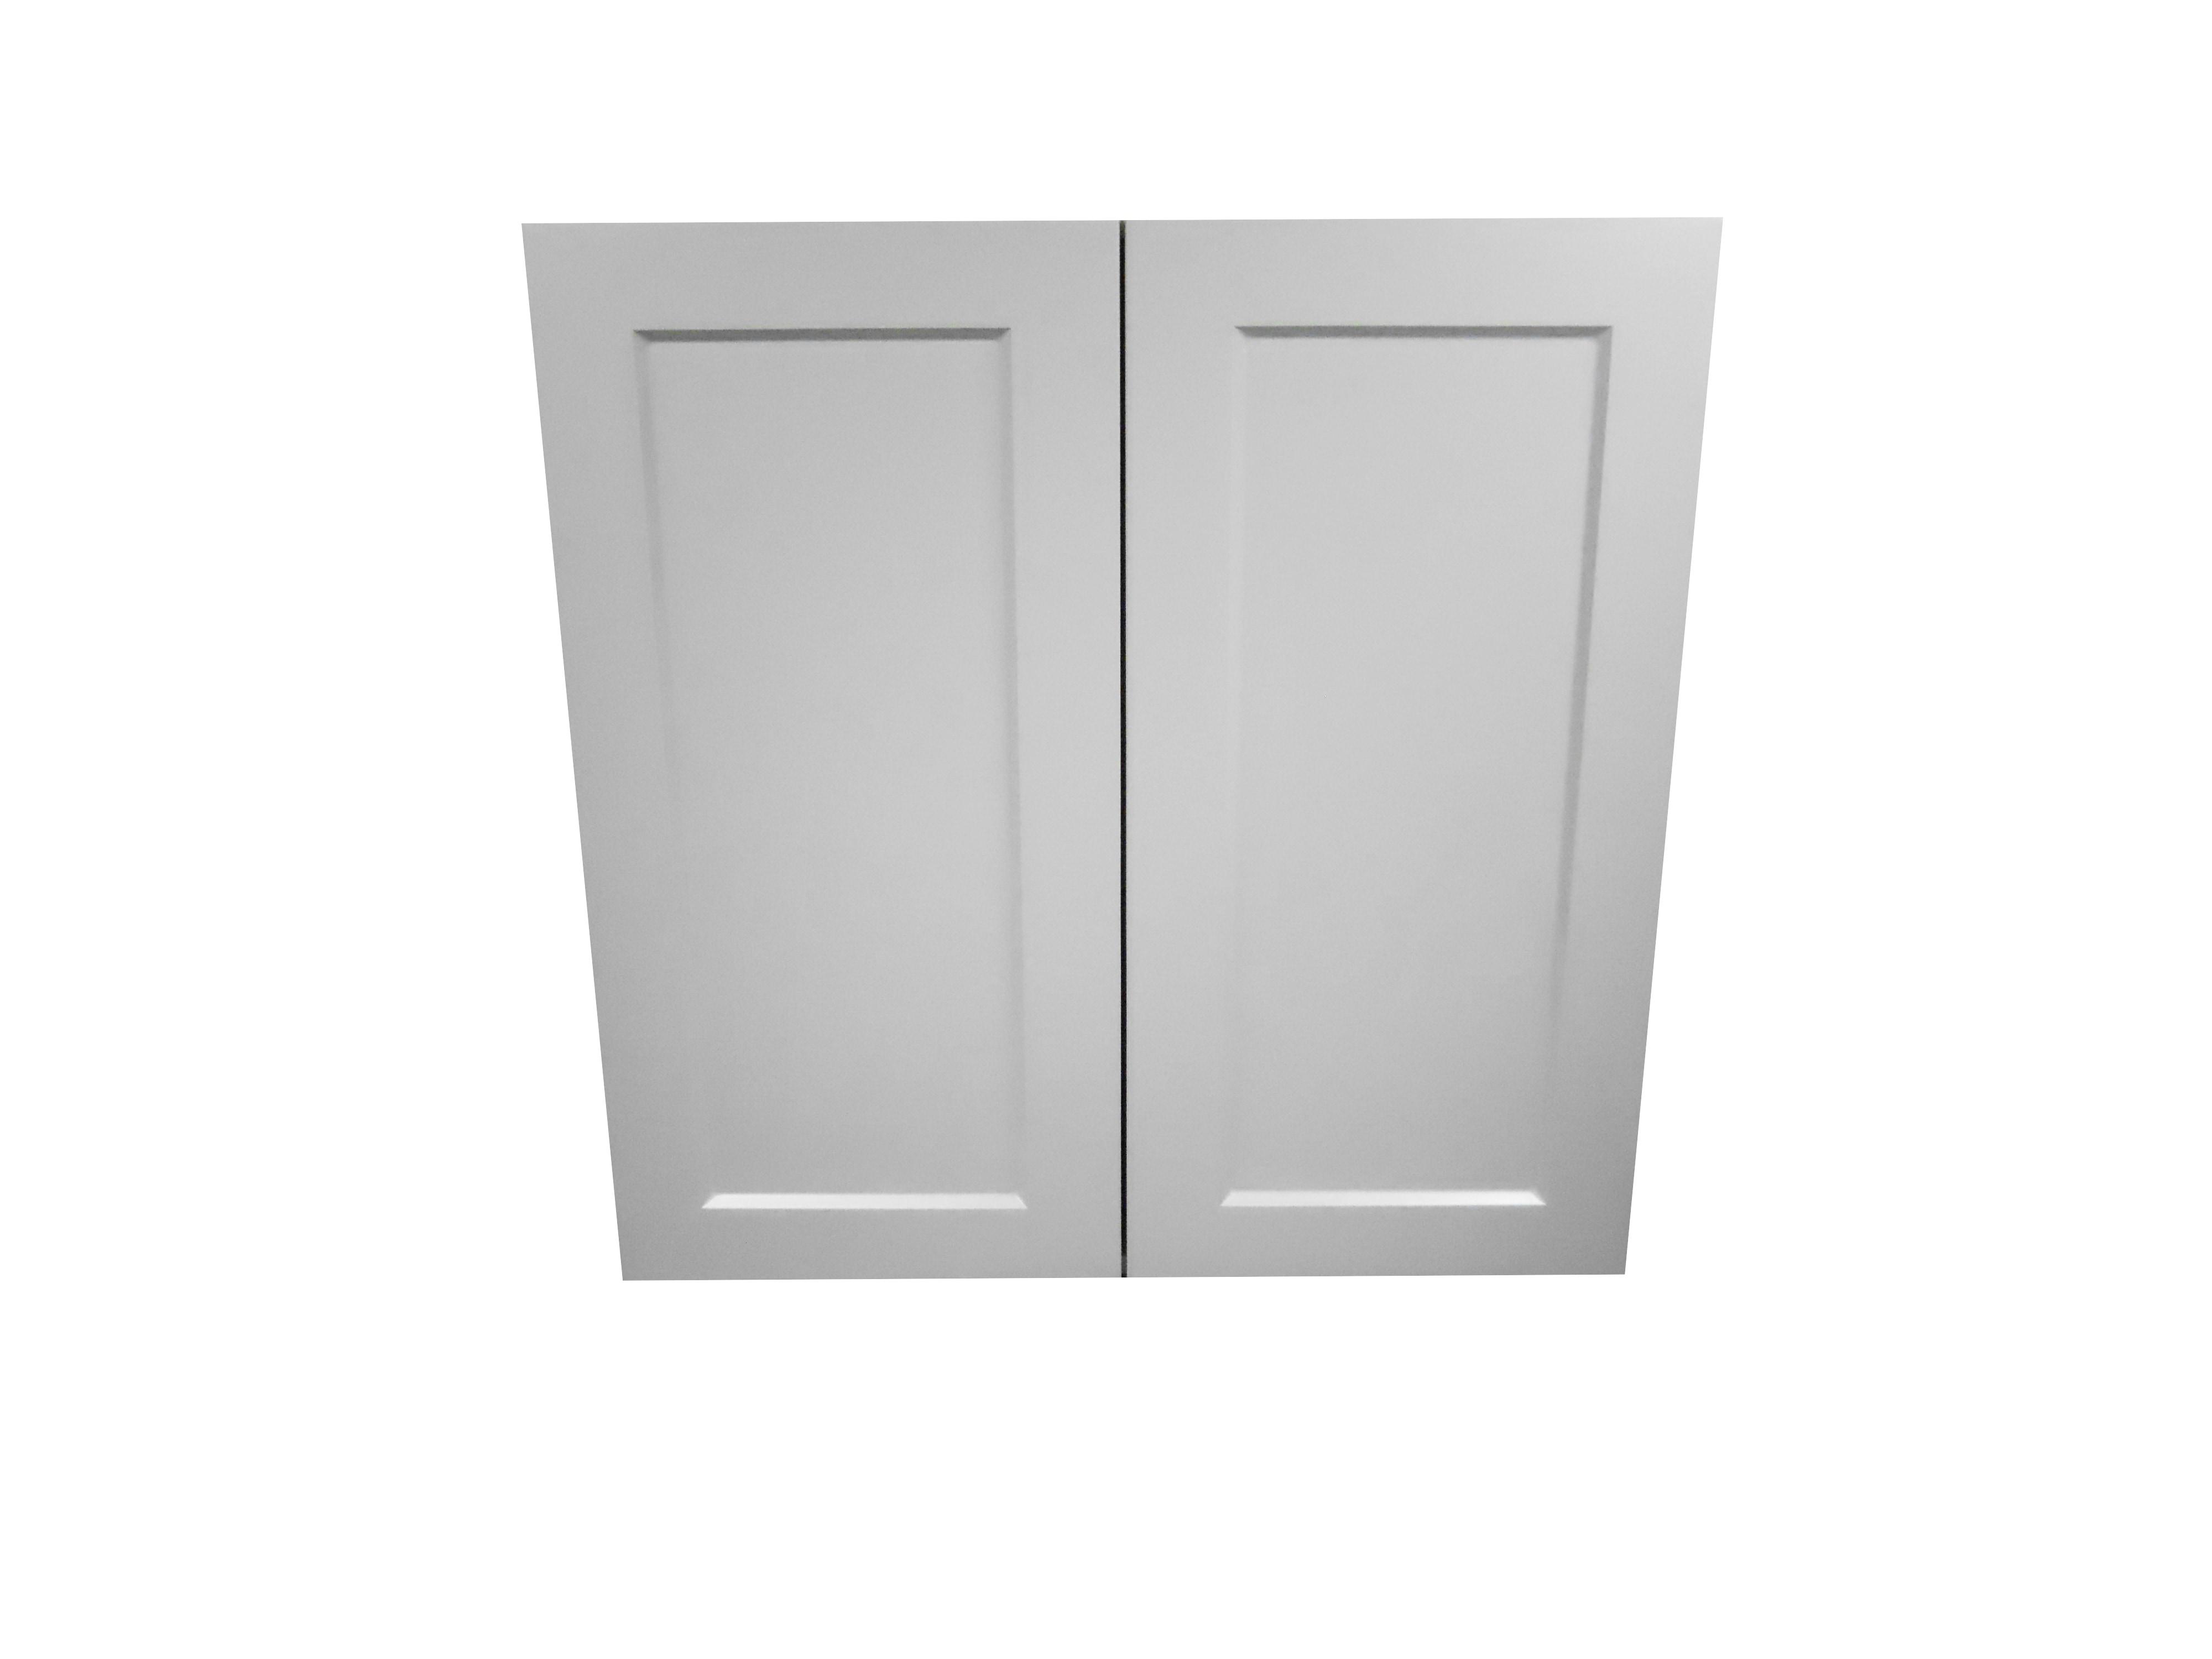 Wall Cabinet with 2 Door / Whistler Grey / Flat Panel Grey / 24x30 Whistler Grey 0